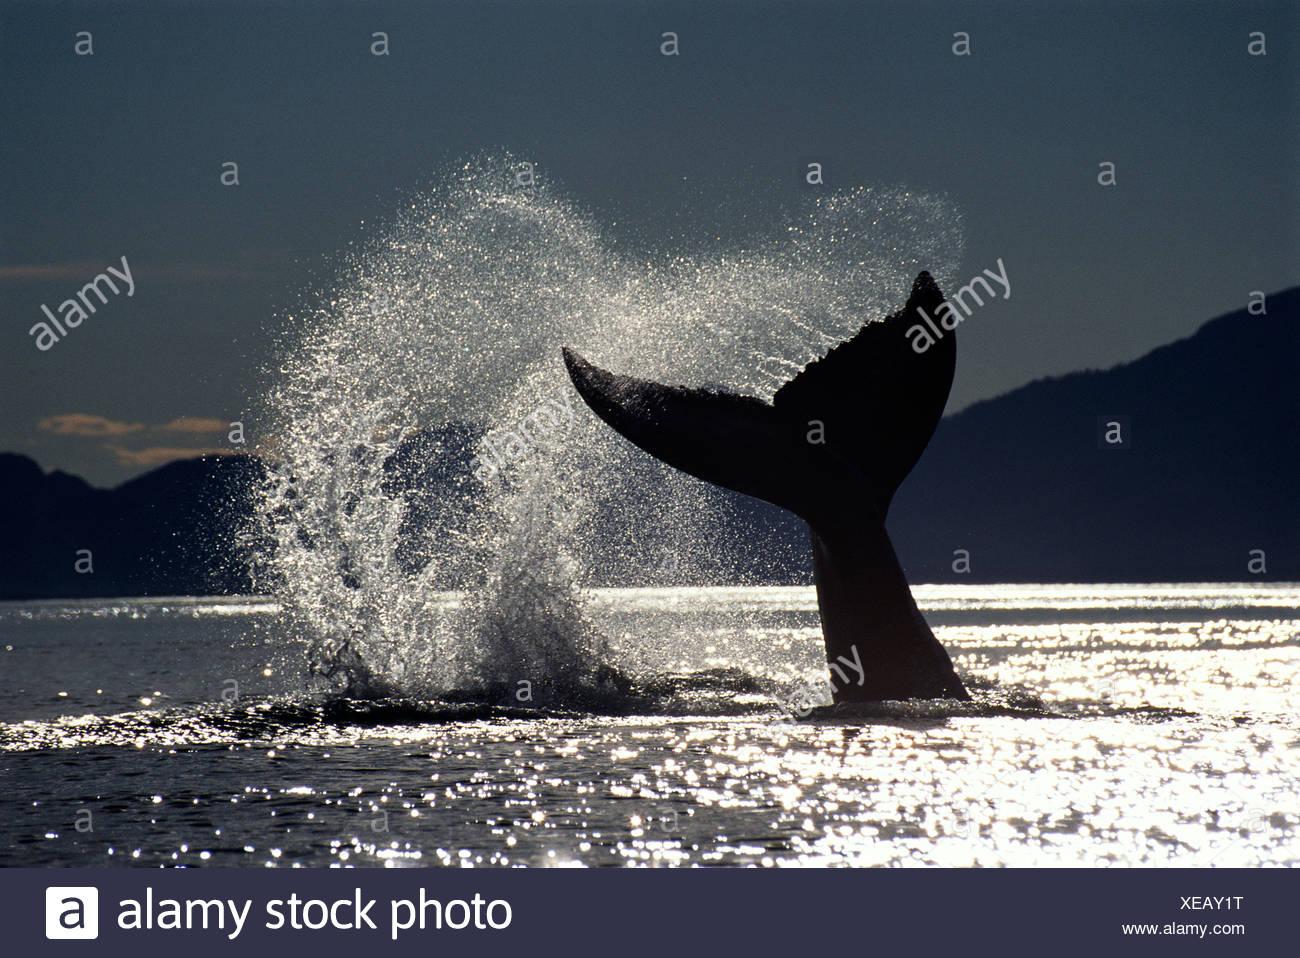 Humpback whale lobtailing, Icy Strait, Southeast Alaska - Stock Image